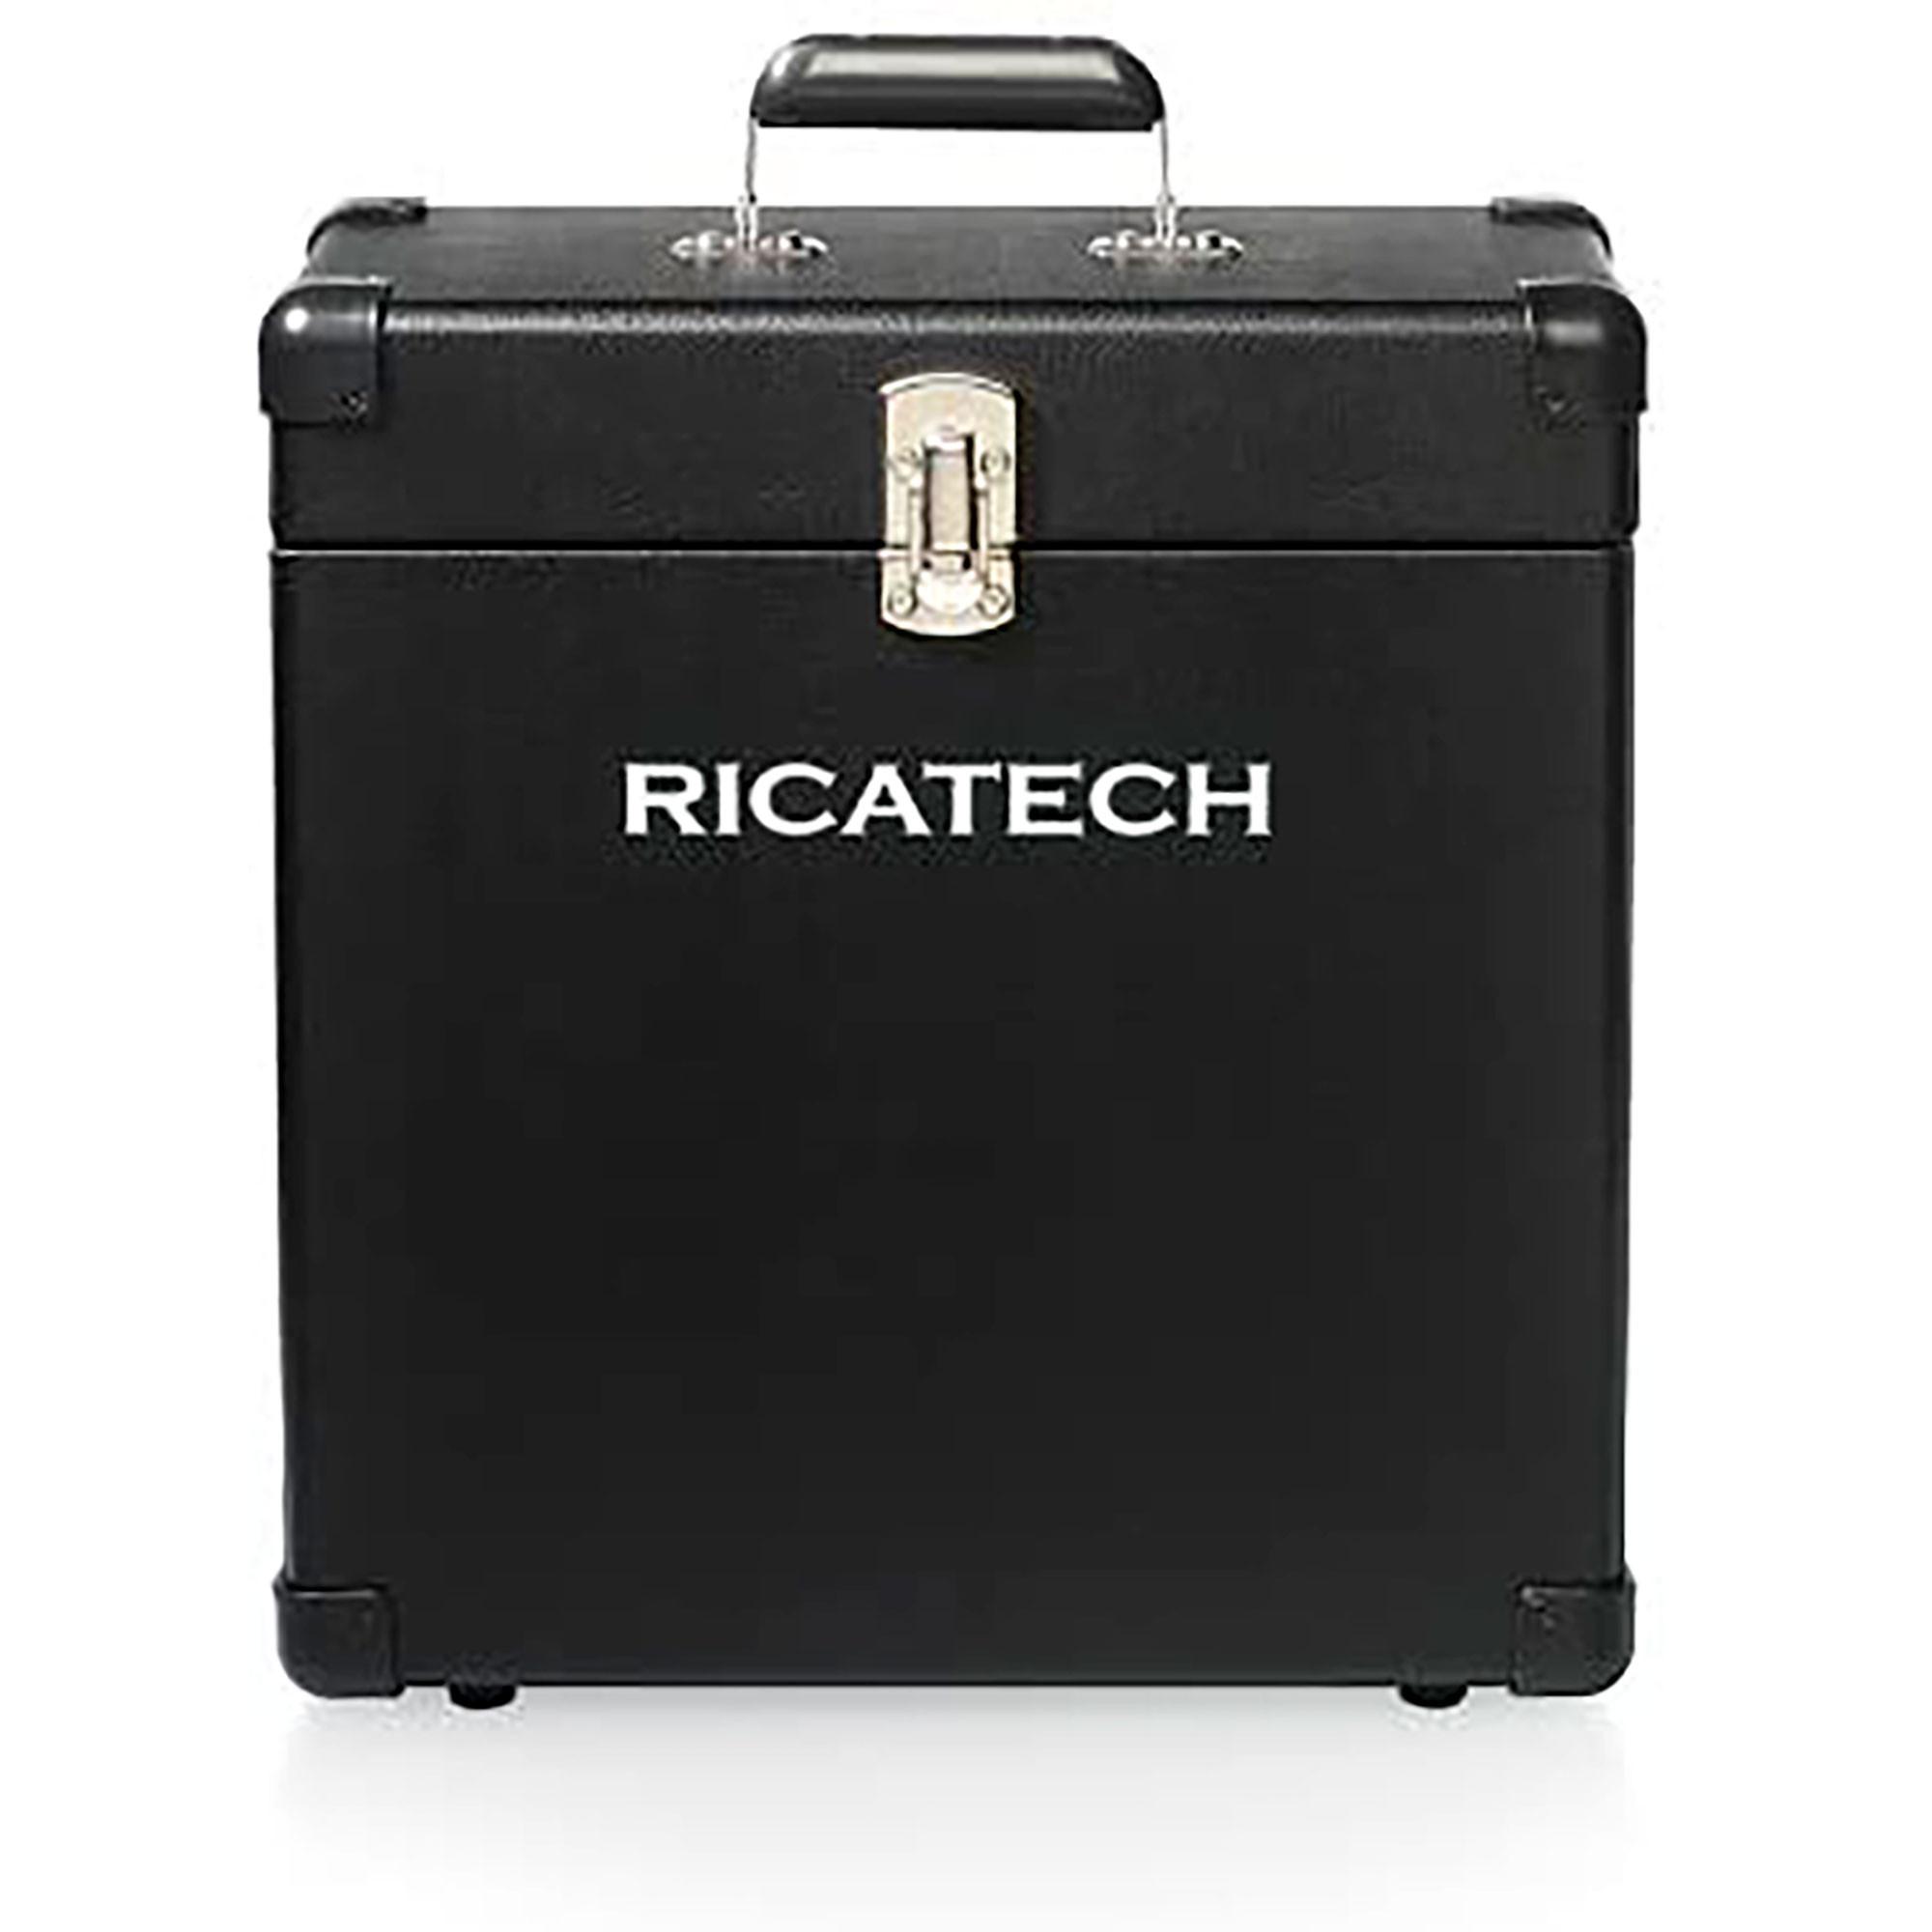 Ricatech RC0042N Maleta Discos Vinilo, Almacenar hasta 30LPs y Singles, Portátil, Negra